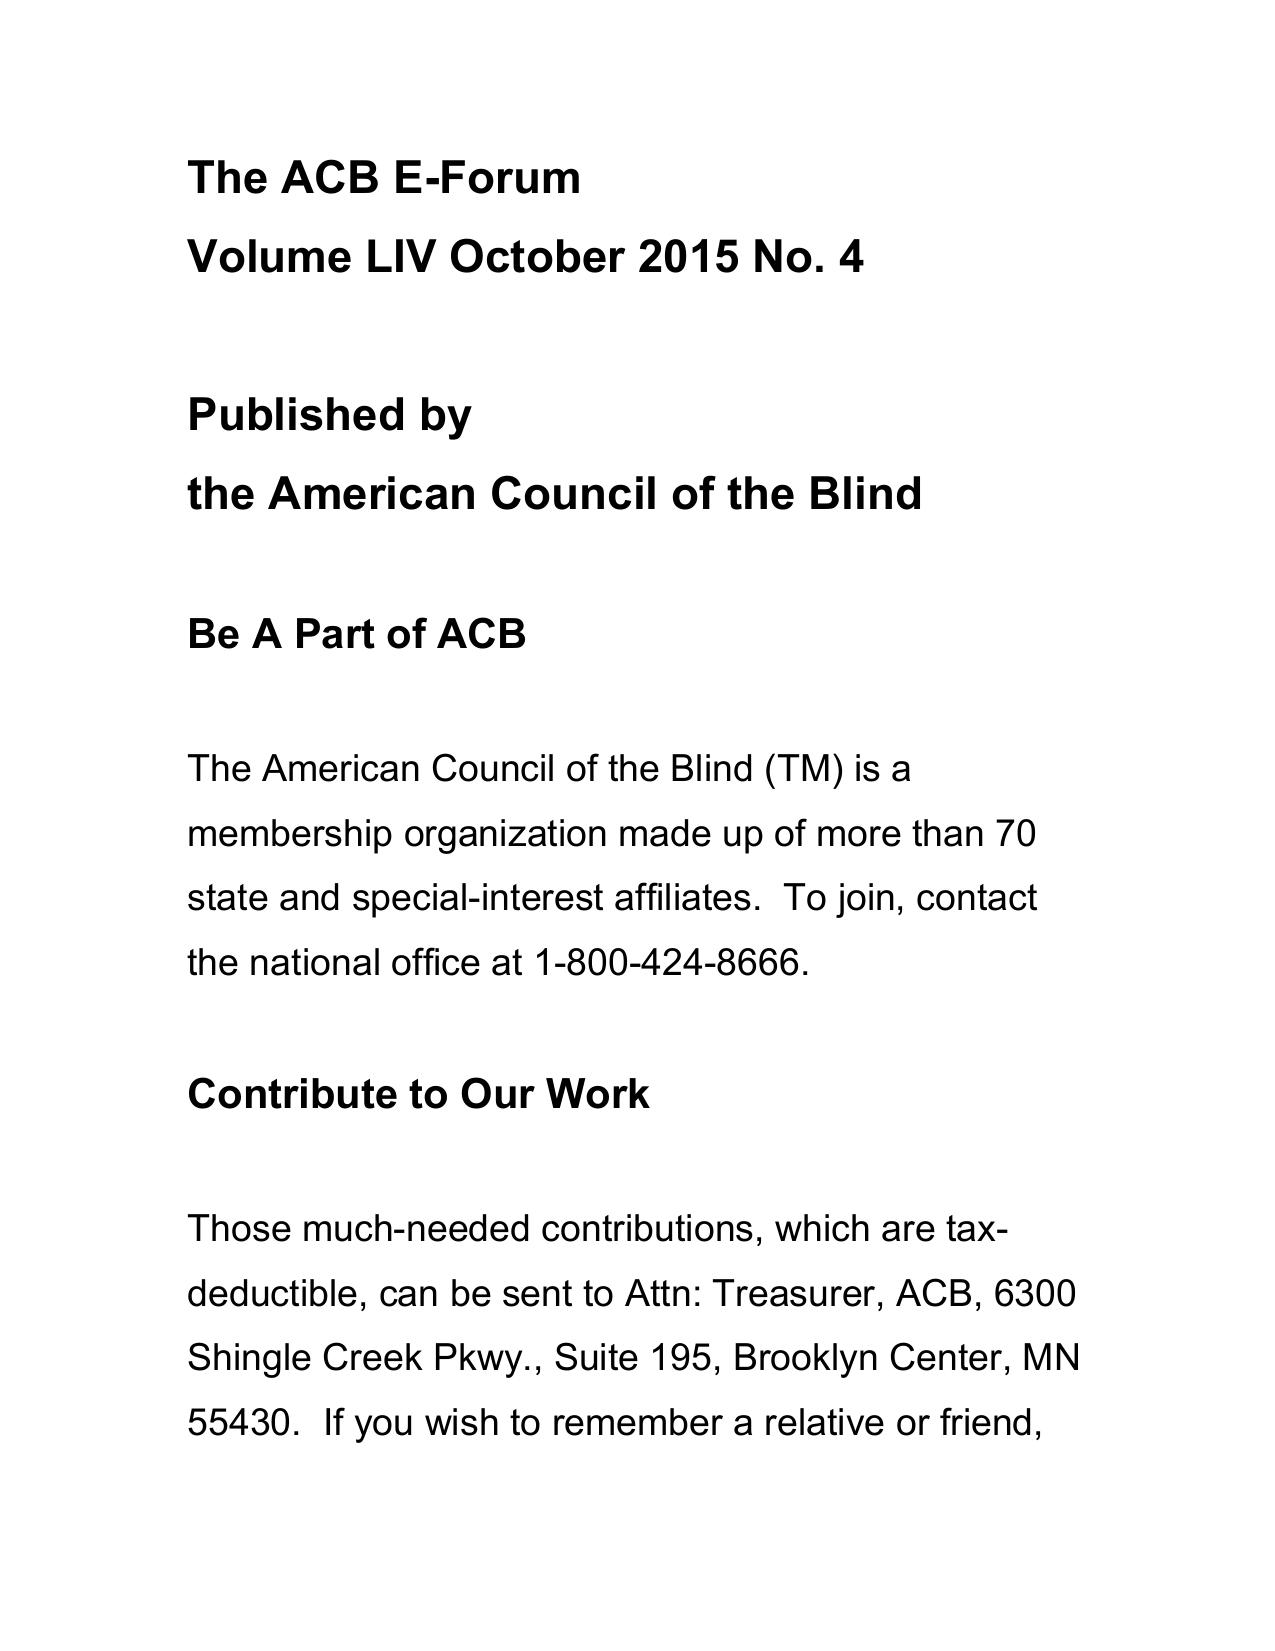 Doc Large Print Format Acb E Forum October 2015